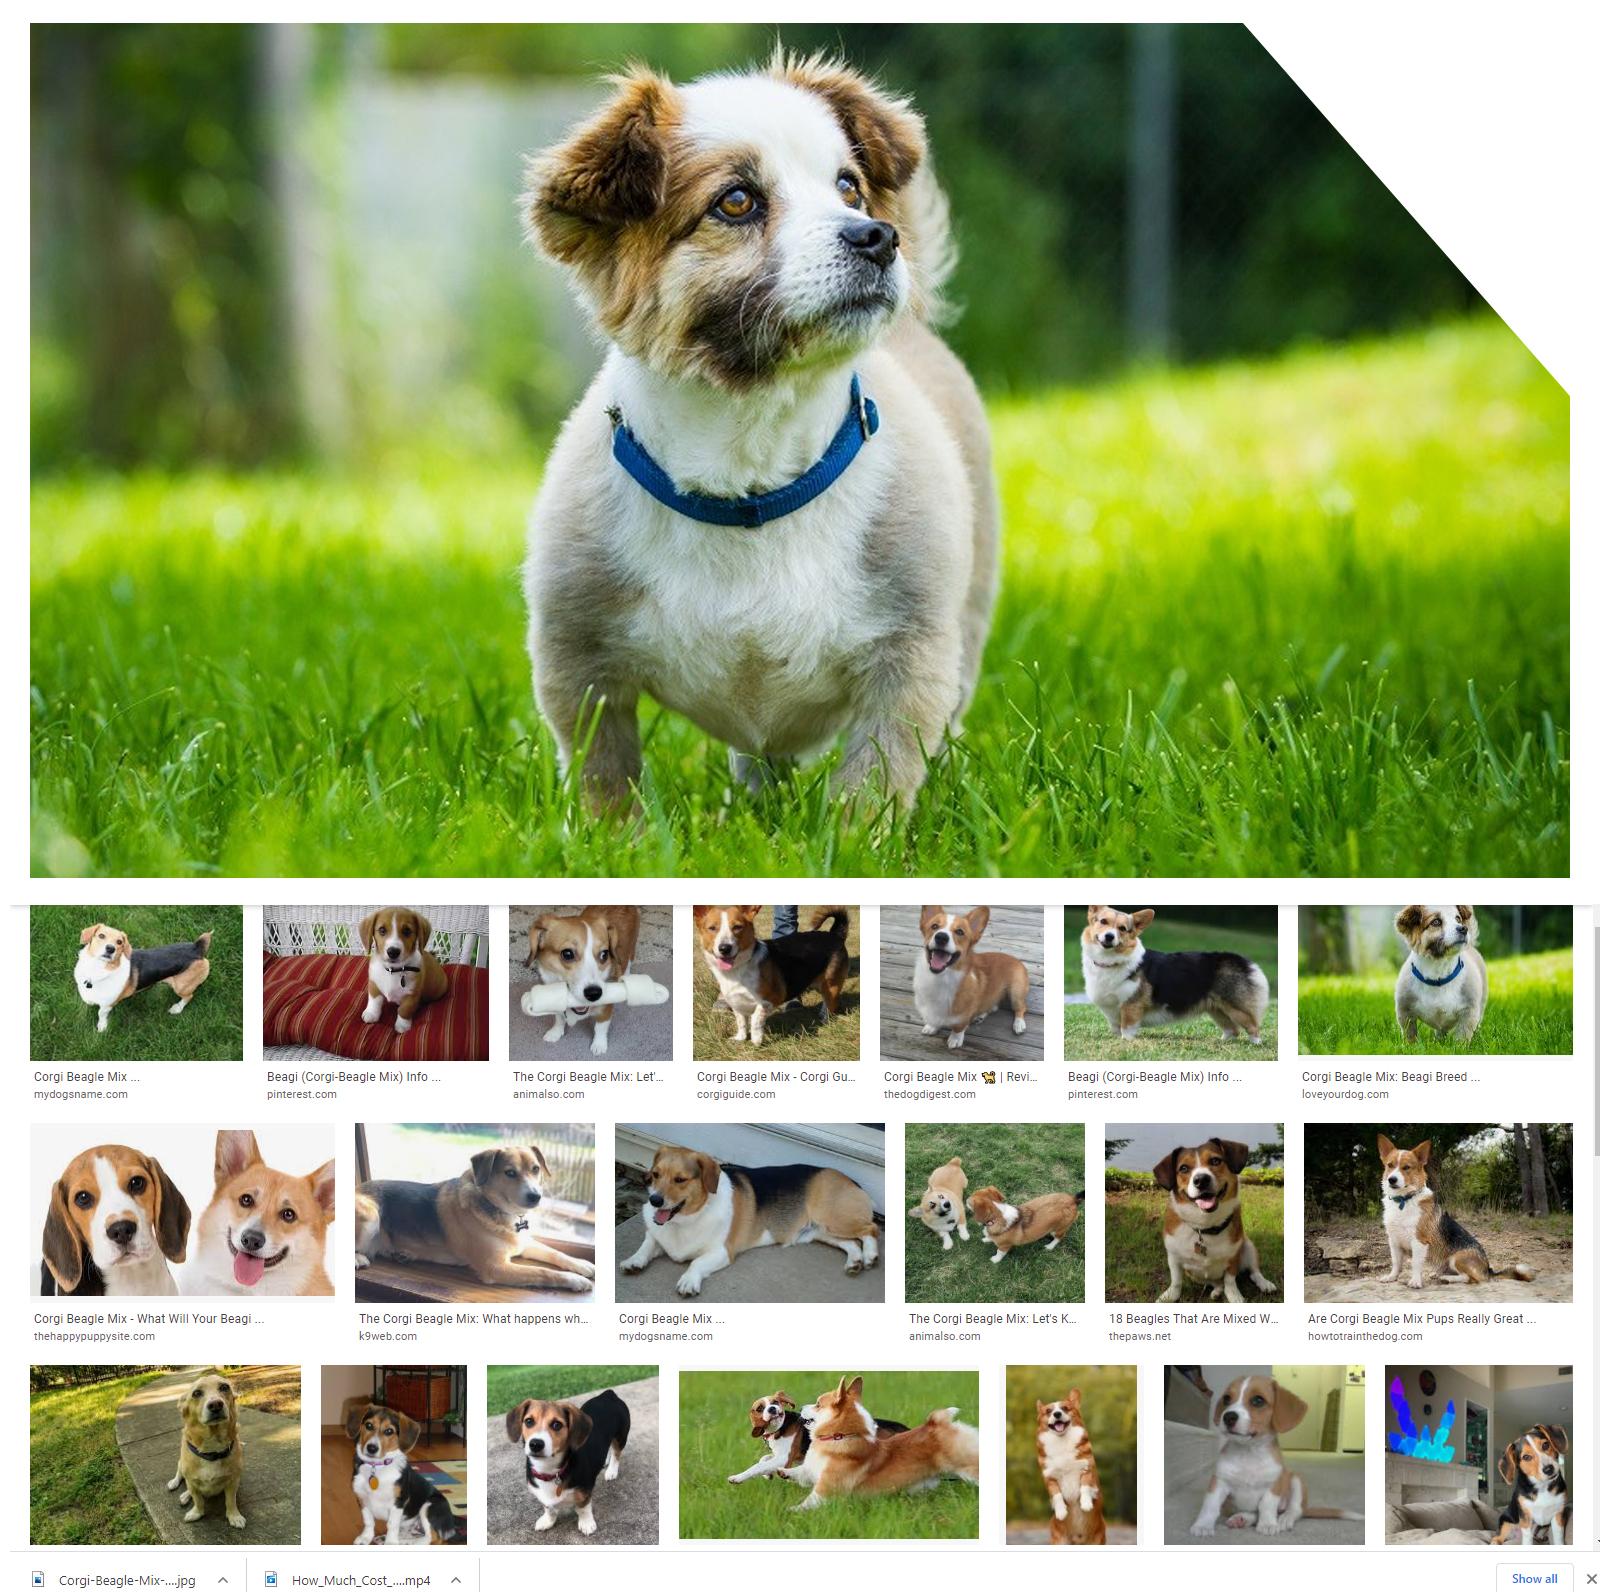 Corgi-Beagle-Mix-all-need-to-know